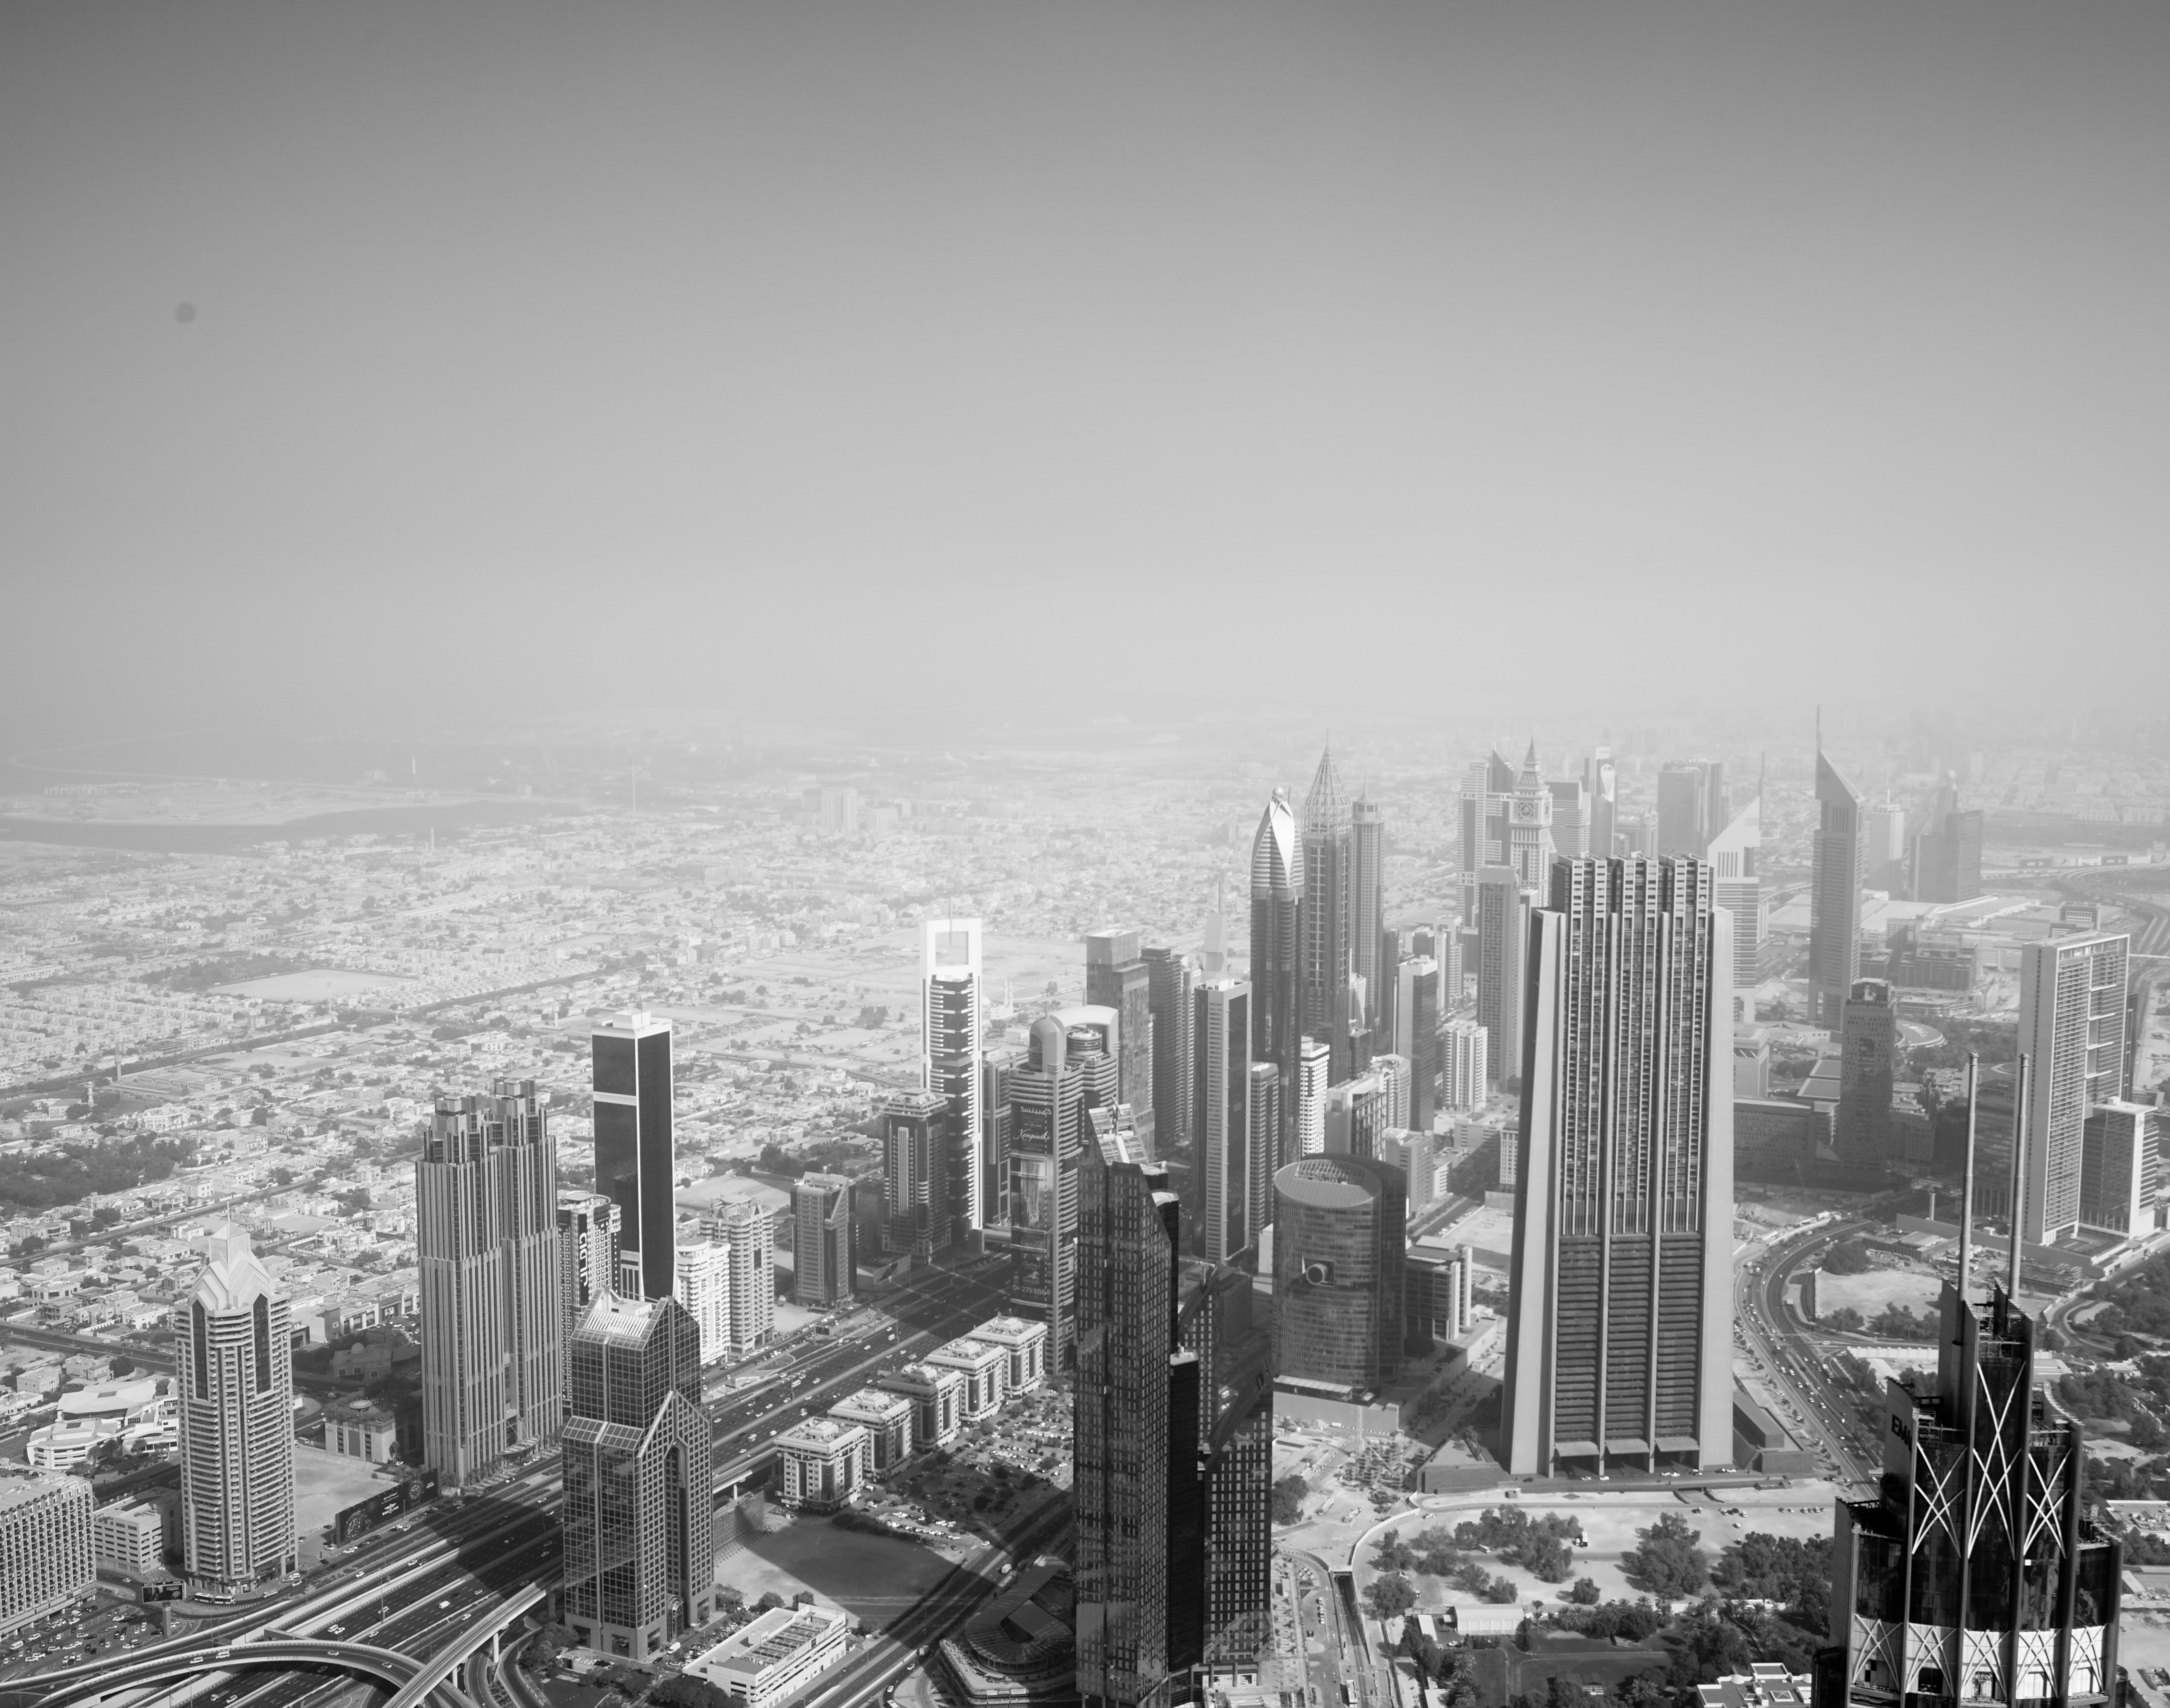 Free stock photo of Dubai city